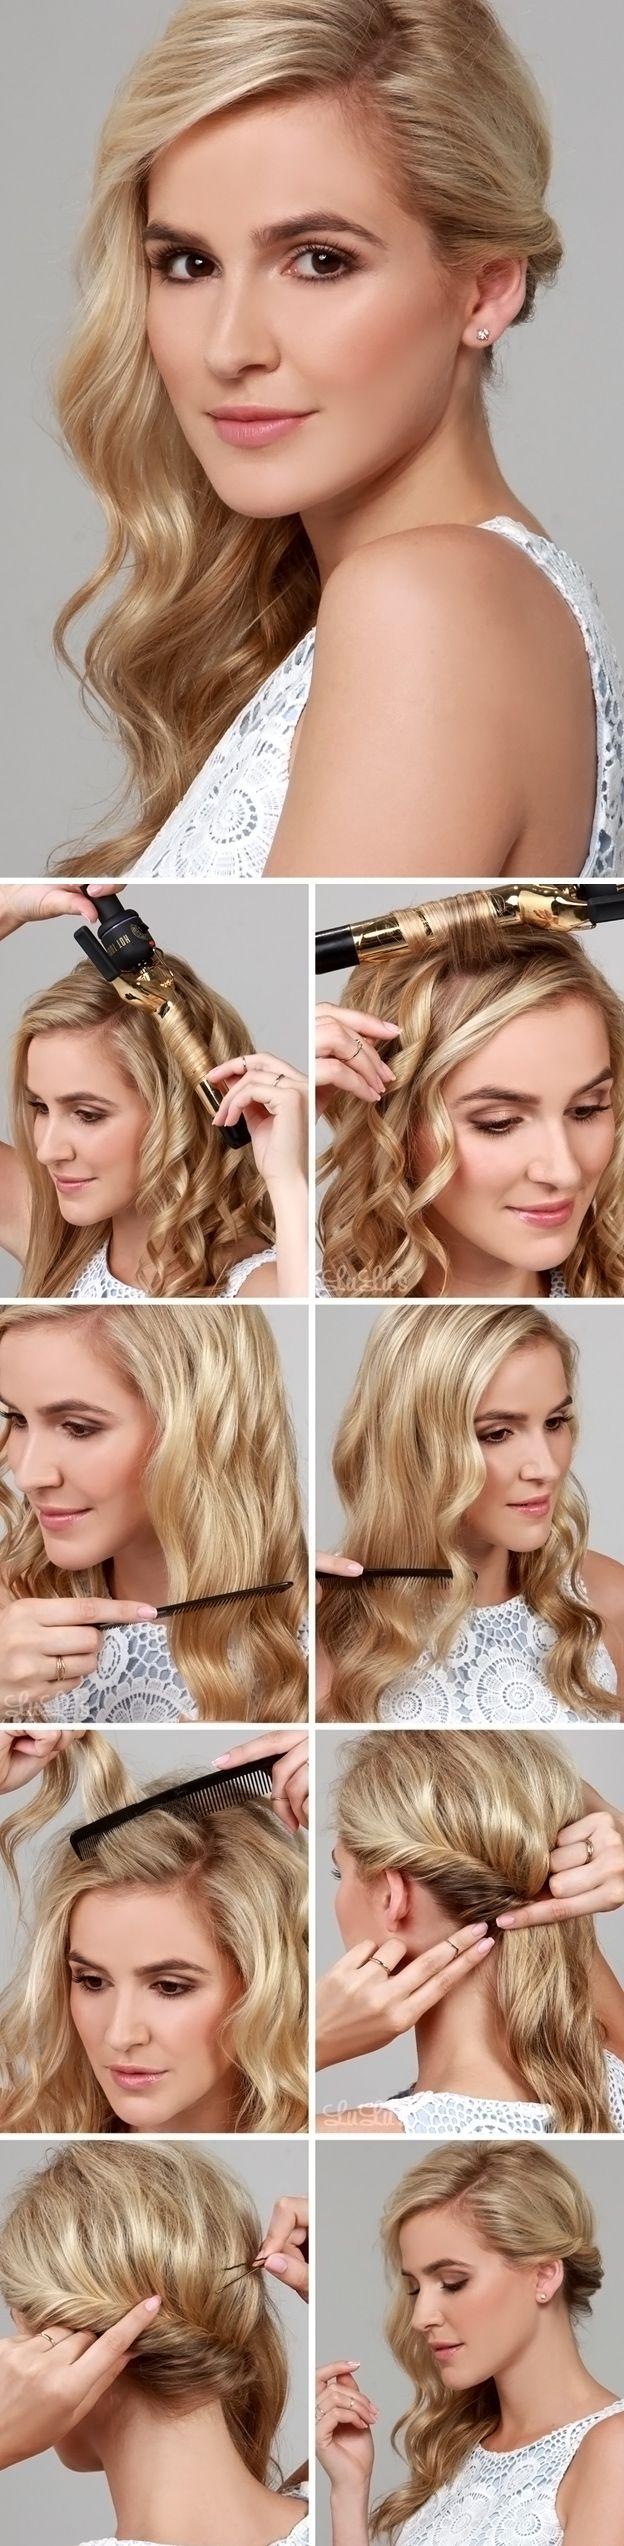 3 Cute Hairstyle Tutorials for Medium Length Hair | MakeUp ...